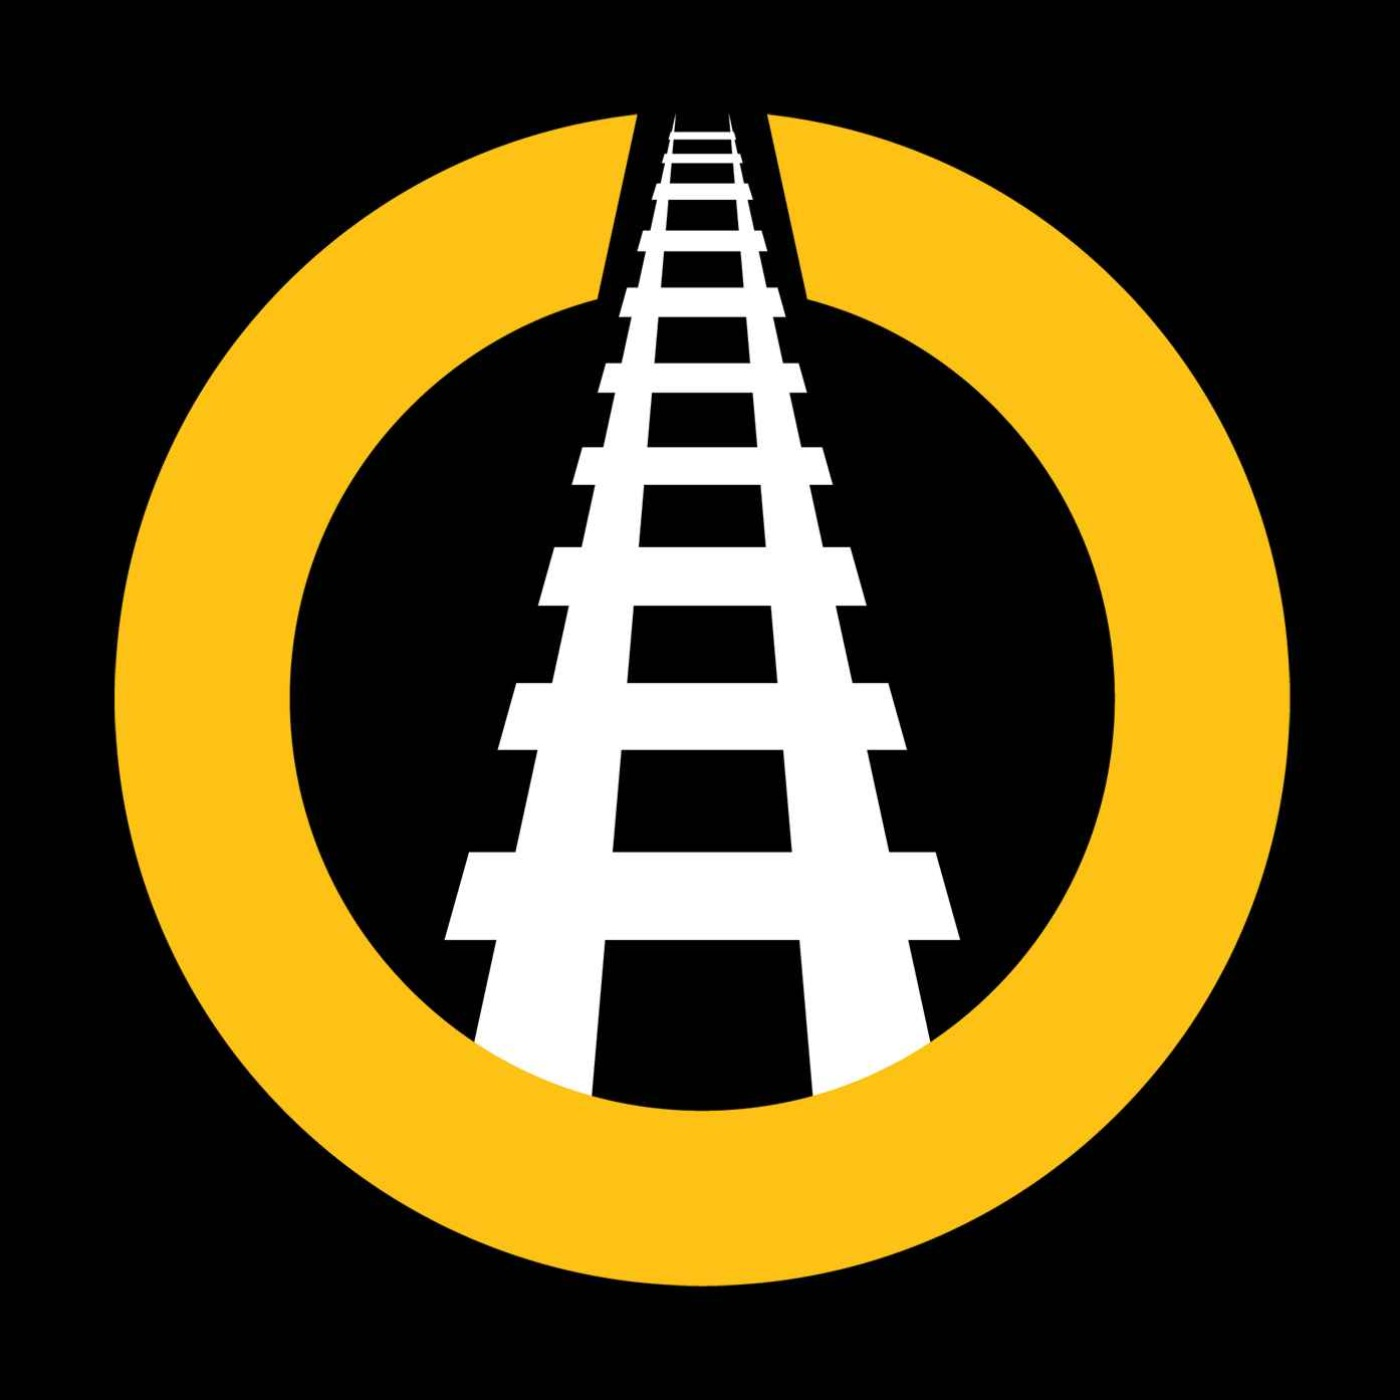 Maintenance driving - keeping the network running